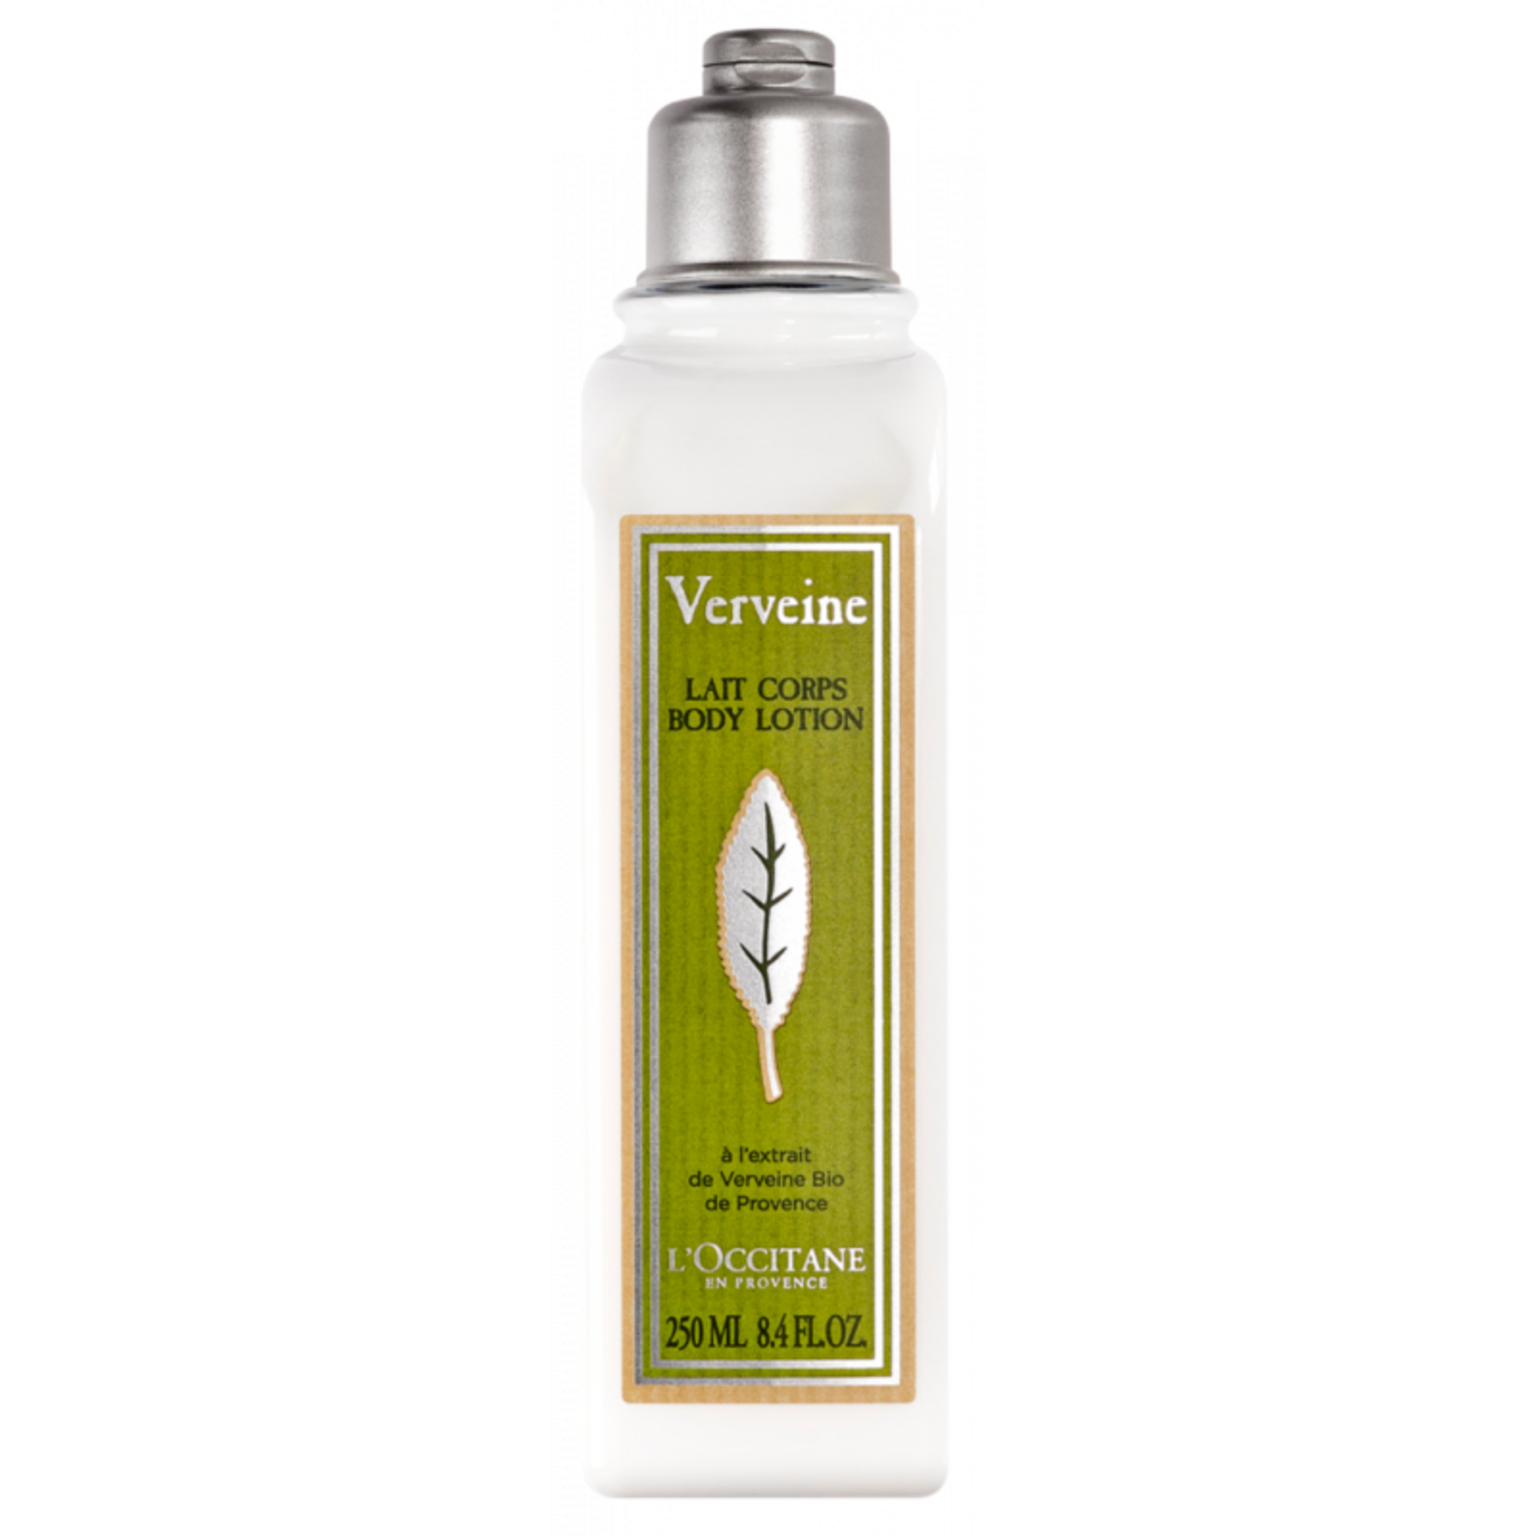 L'Occitane Verbena Body lotion 250ml